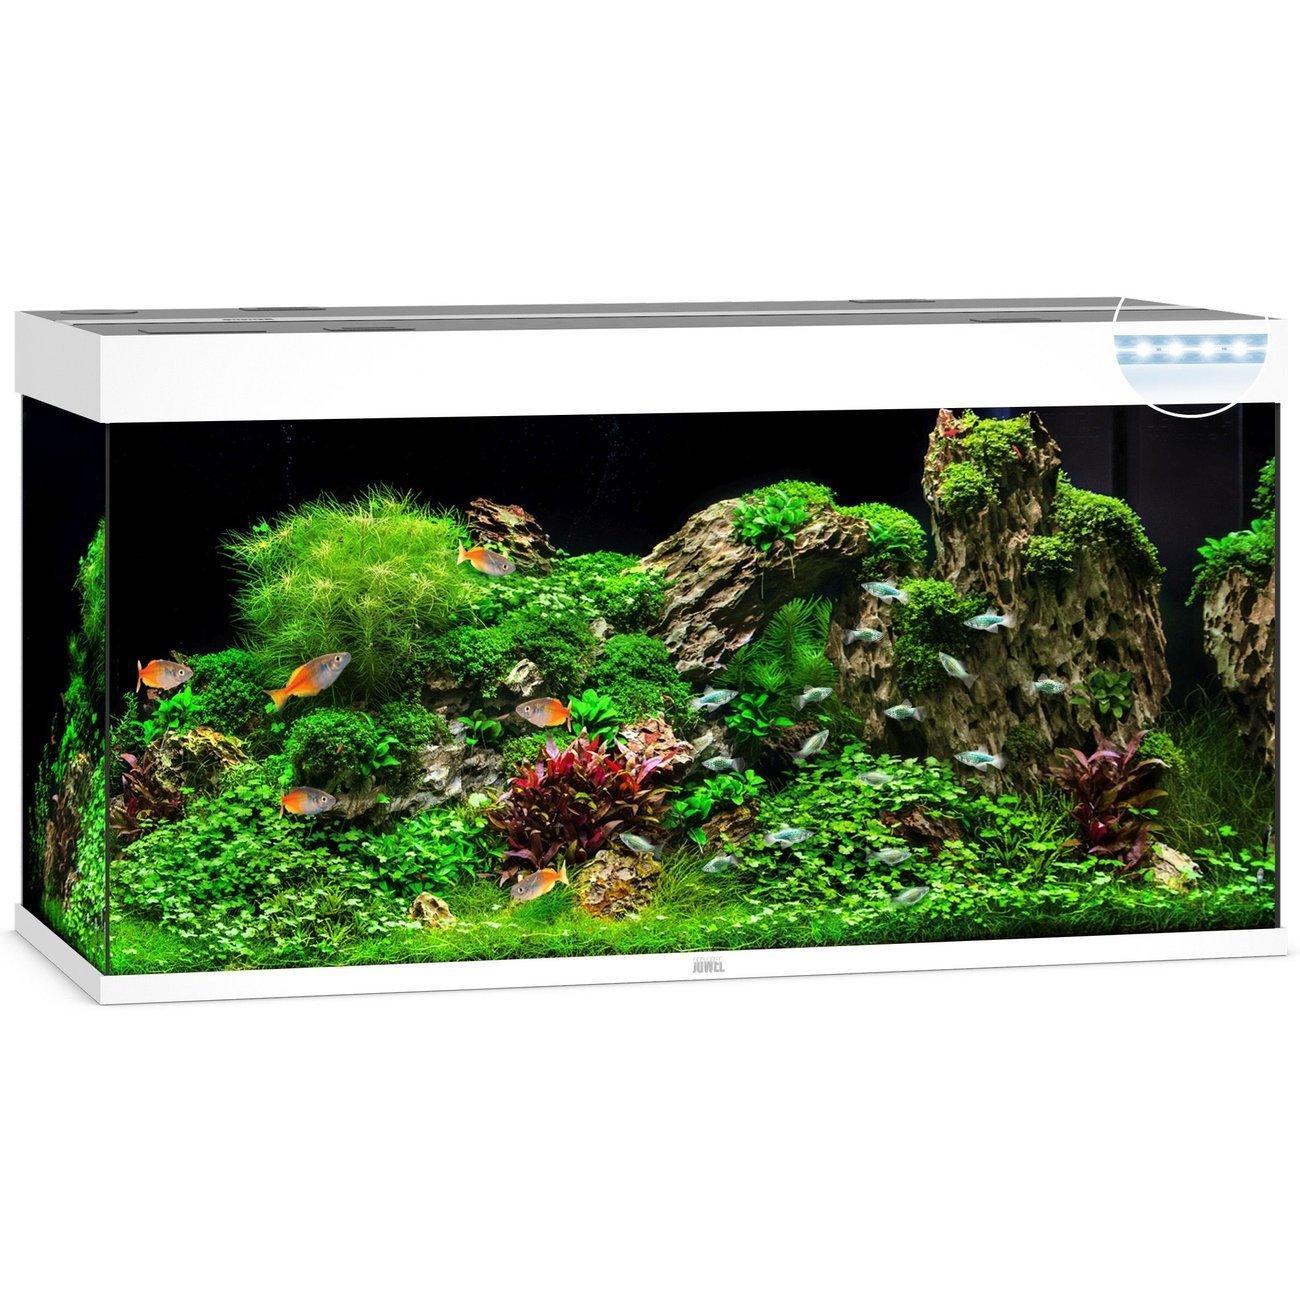 JUWEL Rio 350 LED Aquarium, 350 Liter, weiß